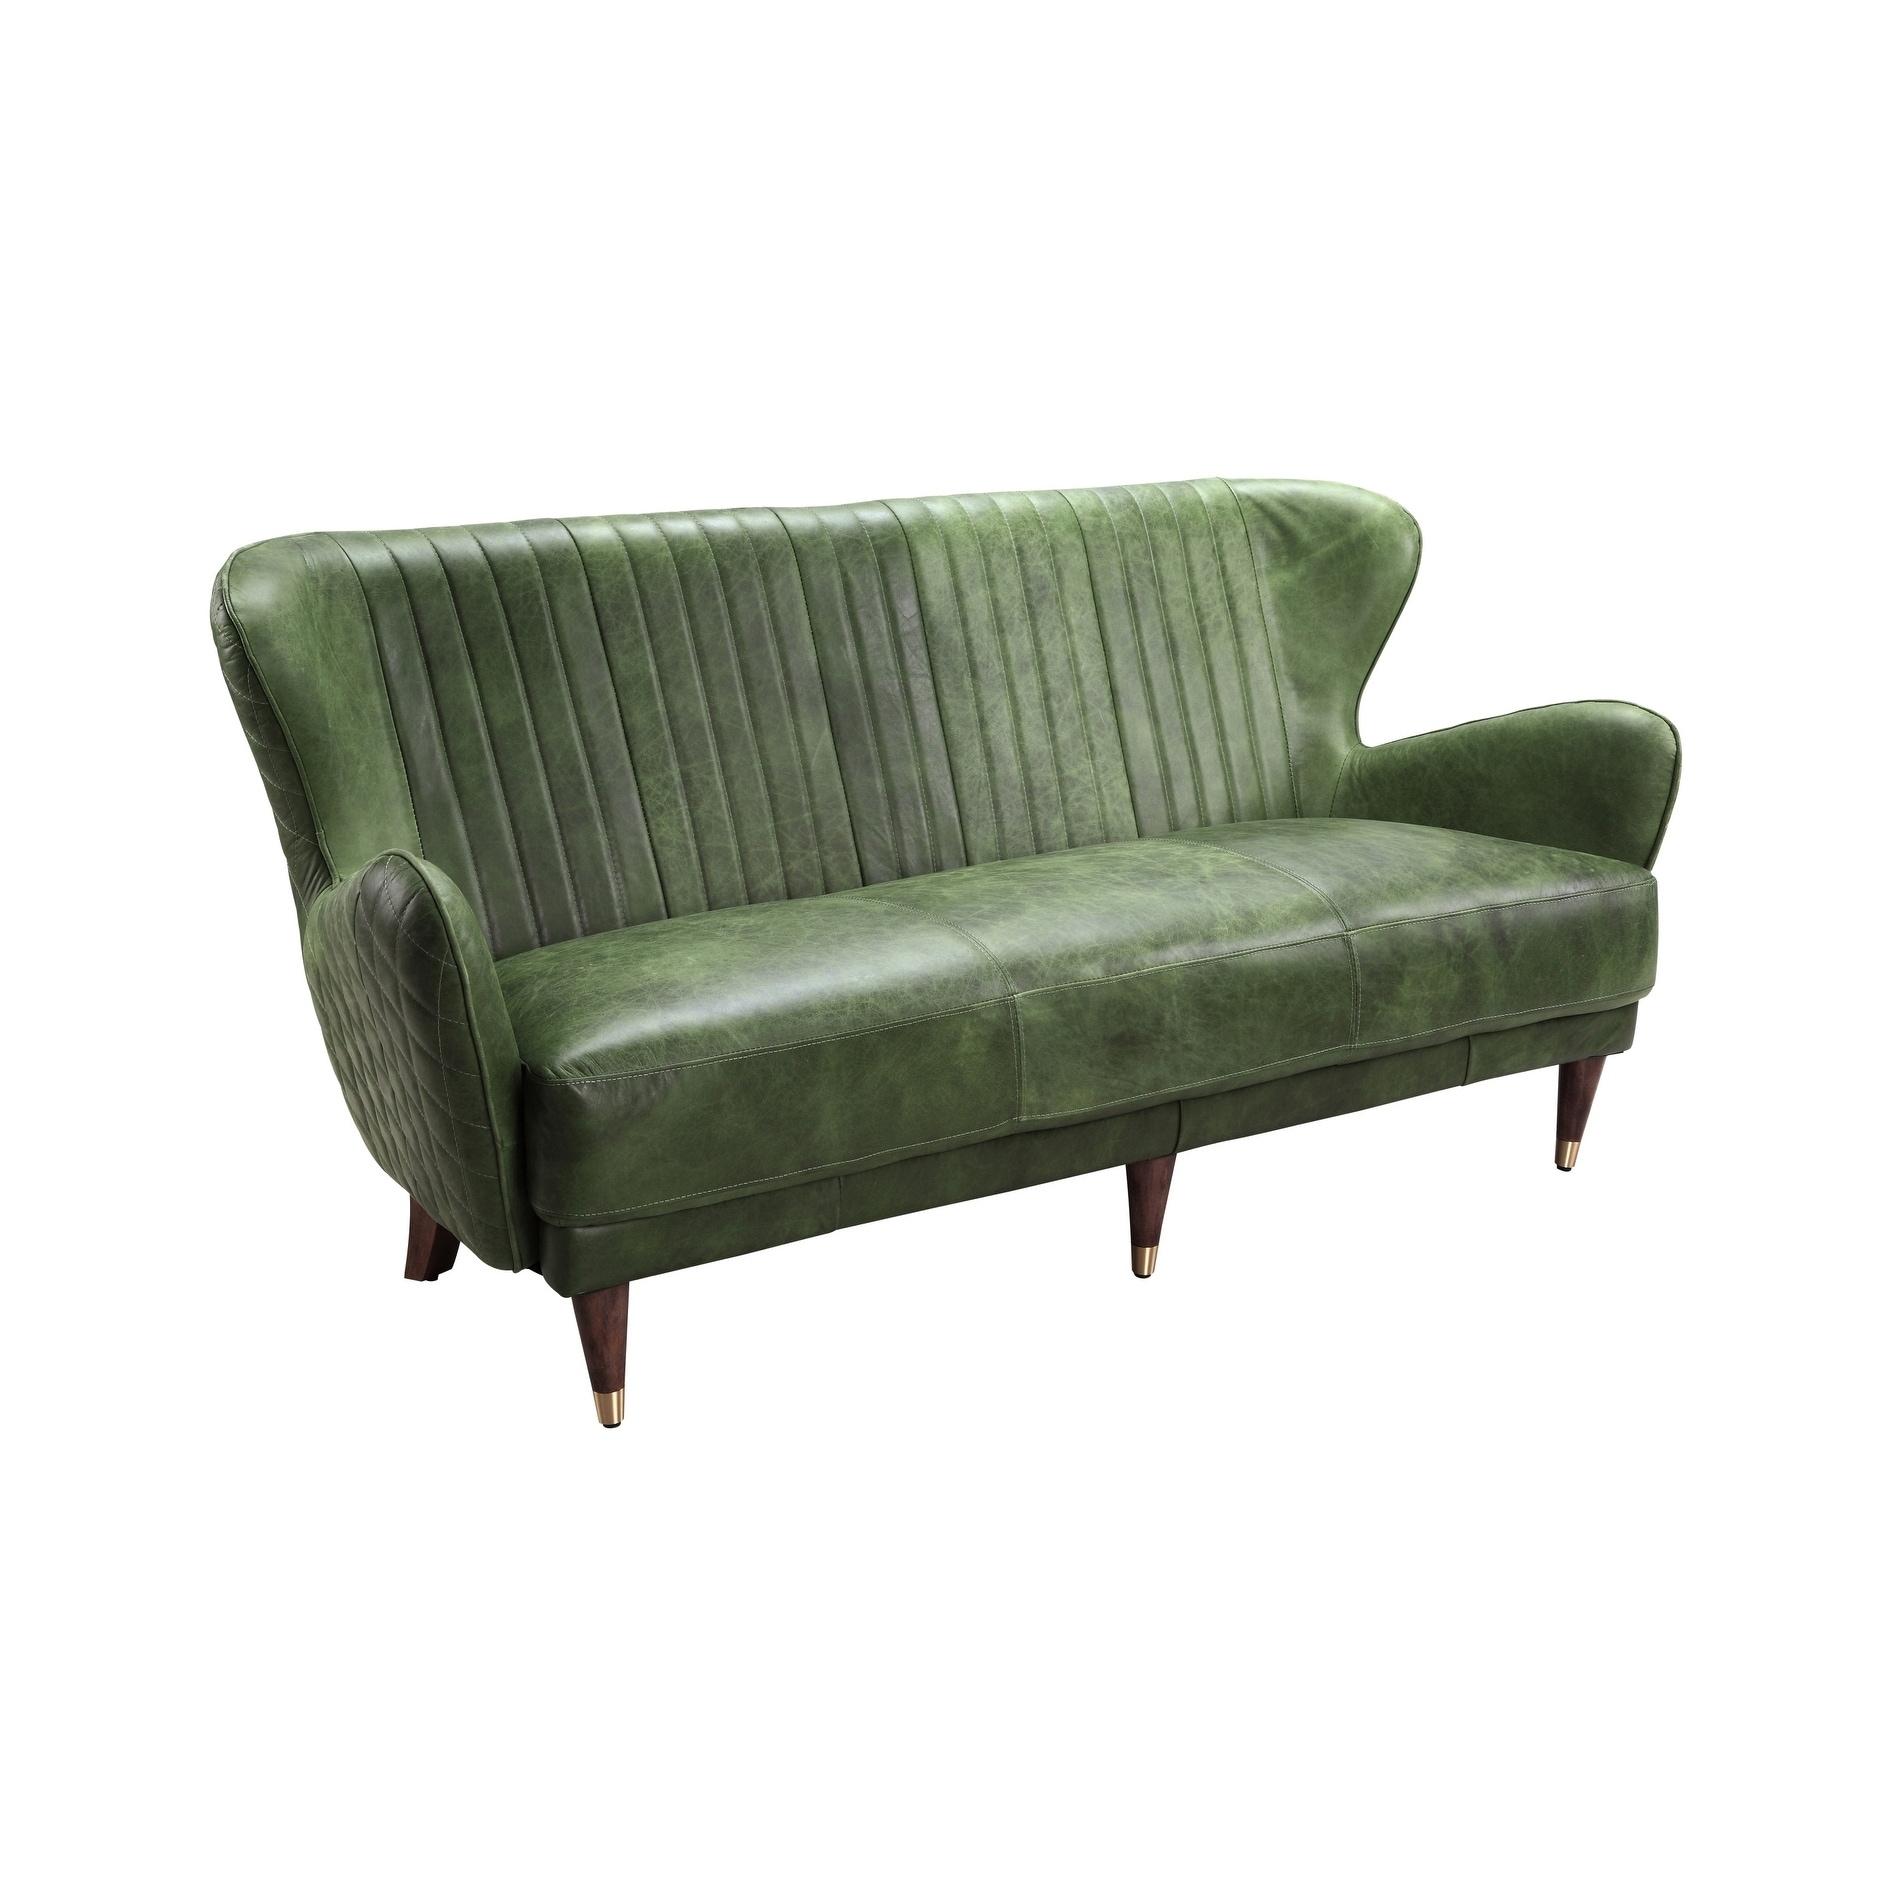 Shop Aurelle Home Copper Green Leather Mid Century Modern Sofa On